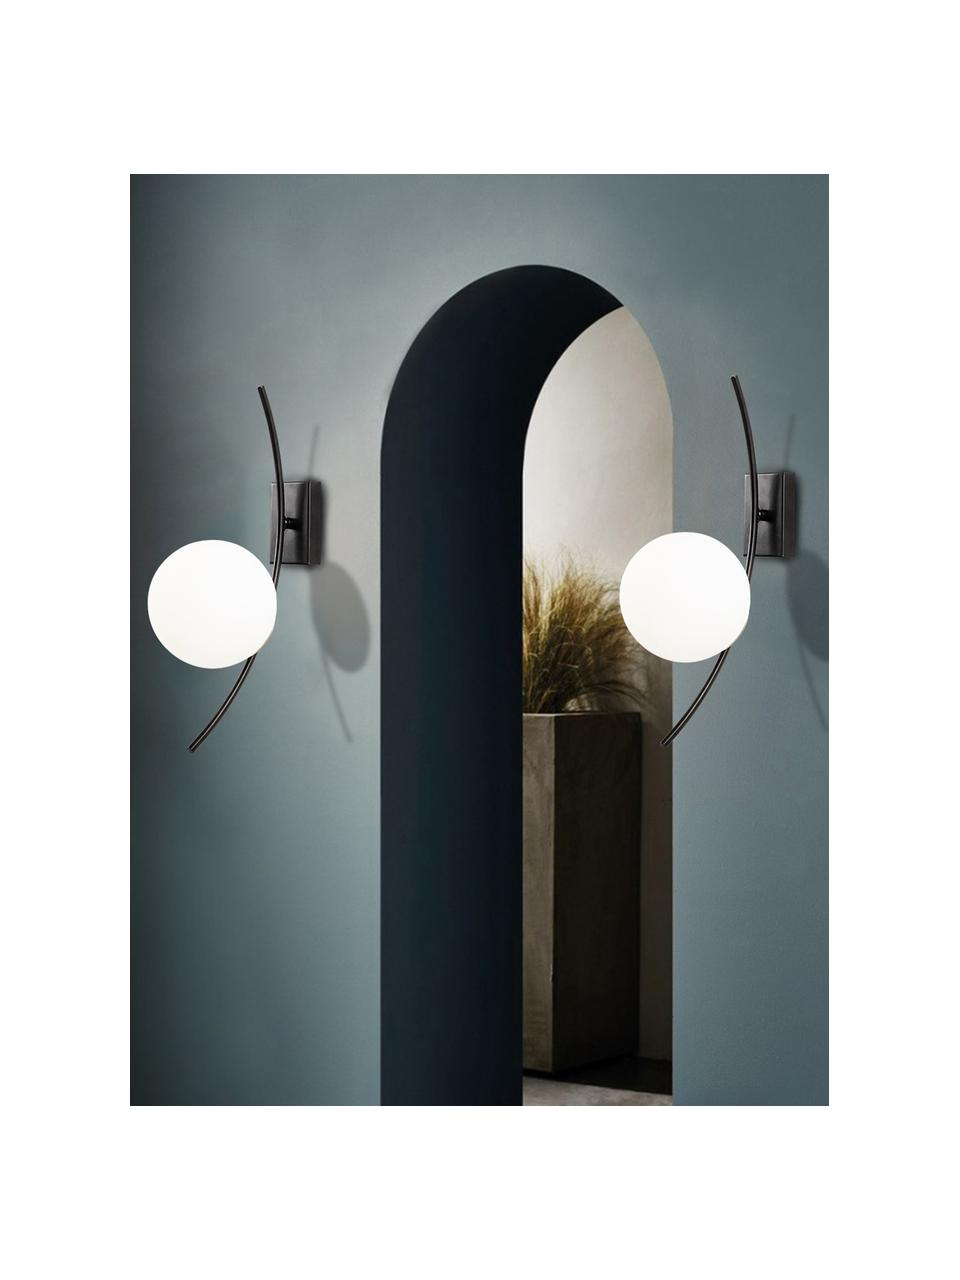 Applique in vetro opale Hilal, Paralume: vetro opale, Nero, bianco opalino, Larg. 15 x Alt. 44 cm